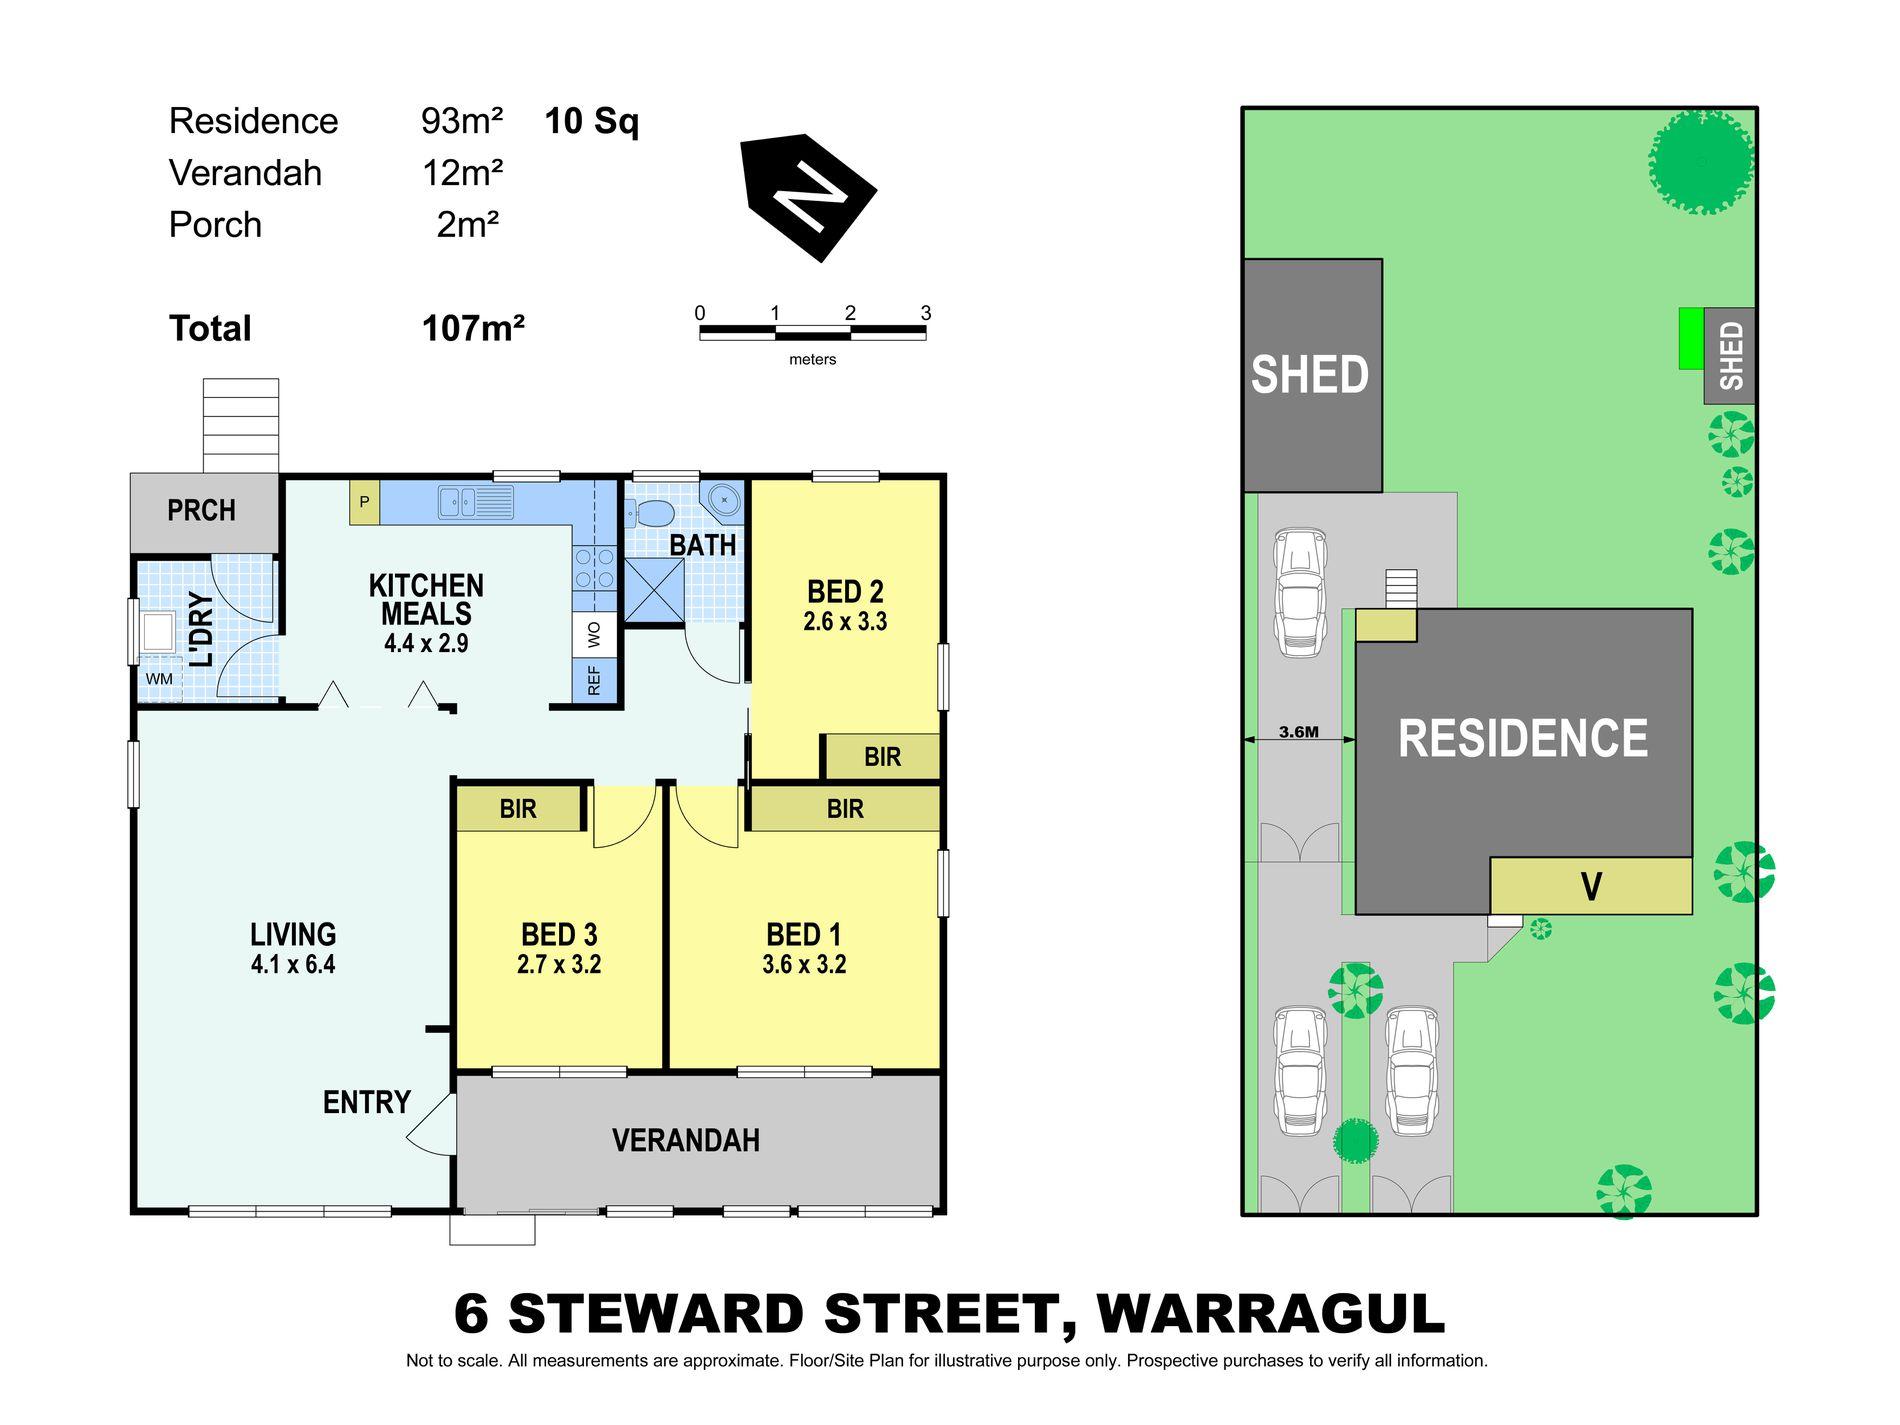 6 Steward Street, Warragul